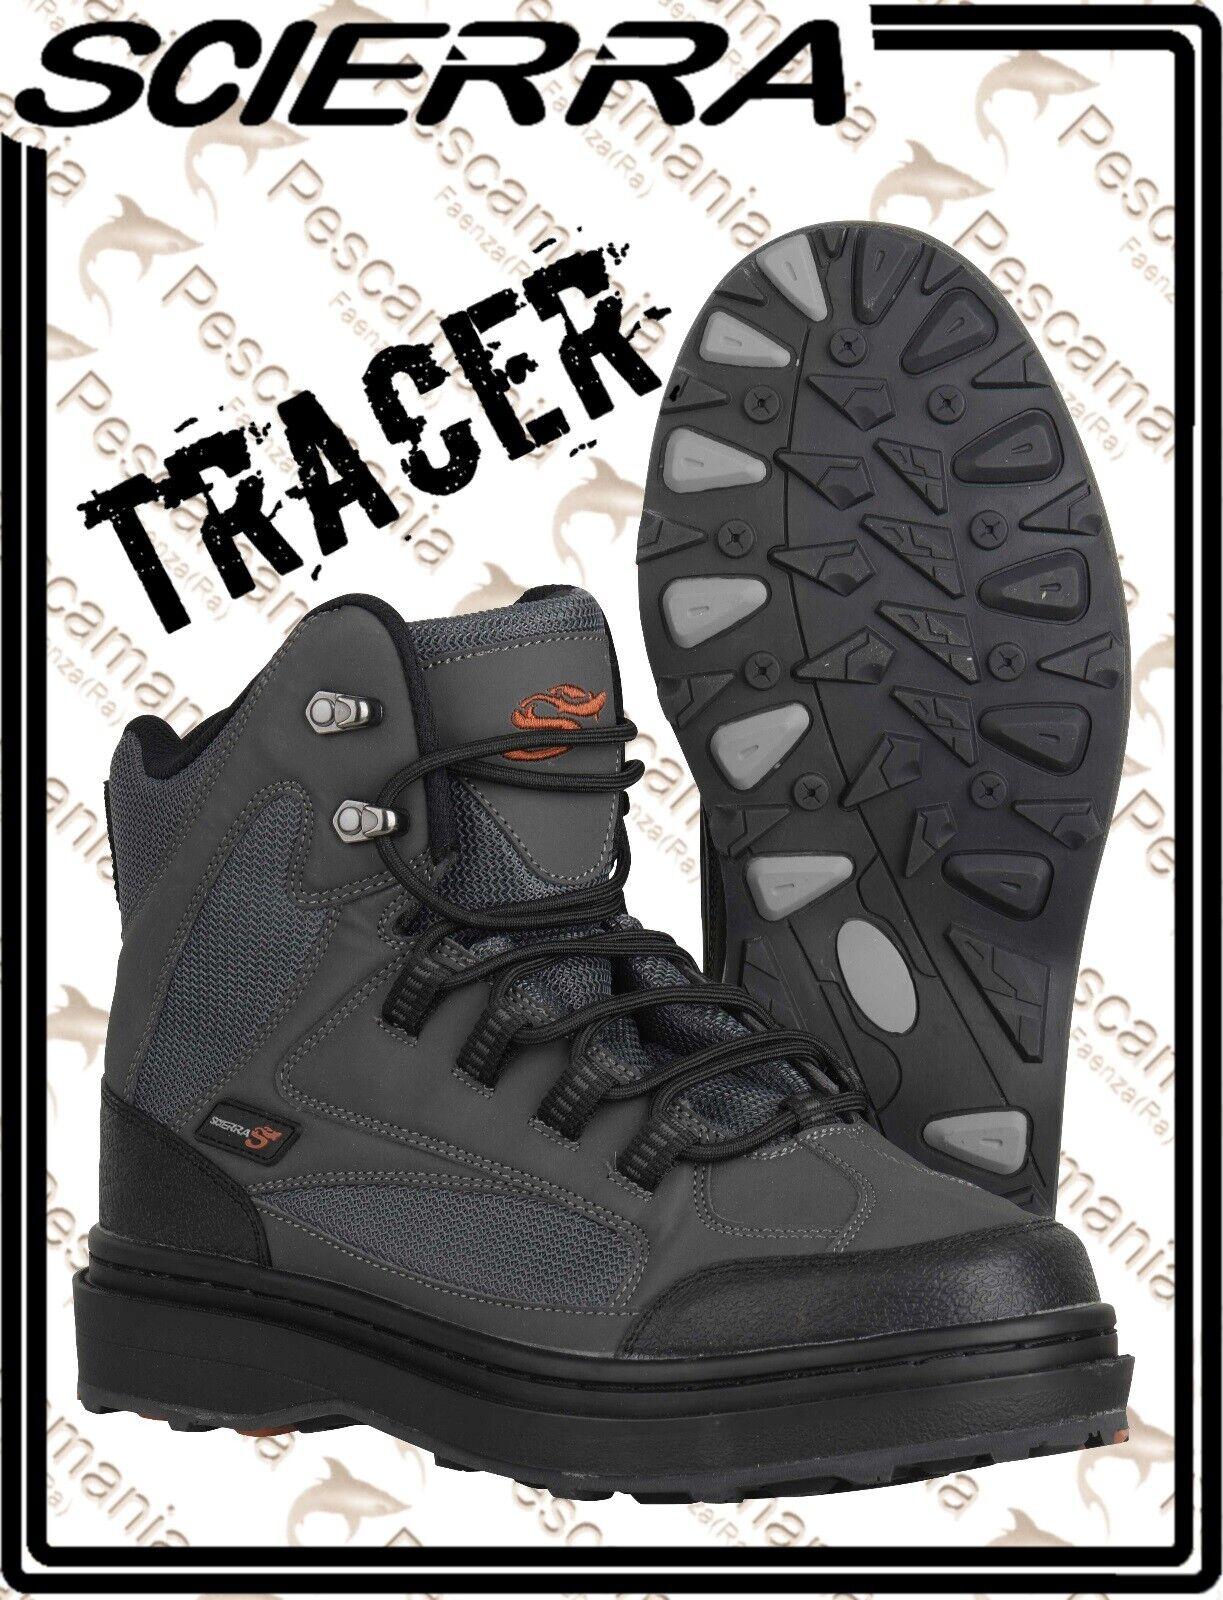 Scarpone da wader Scierra TRACER Wading scarpe gomma